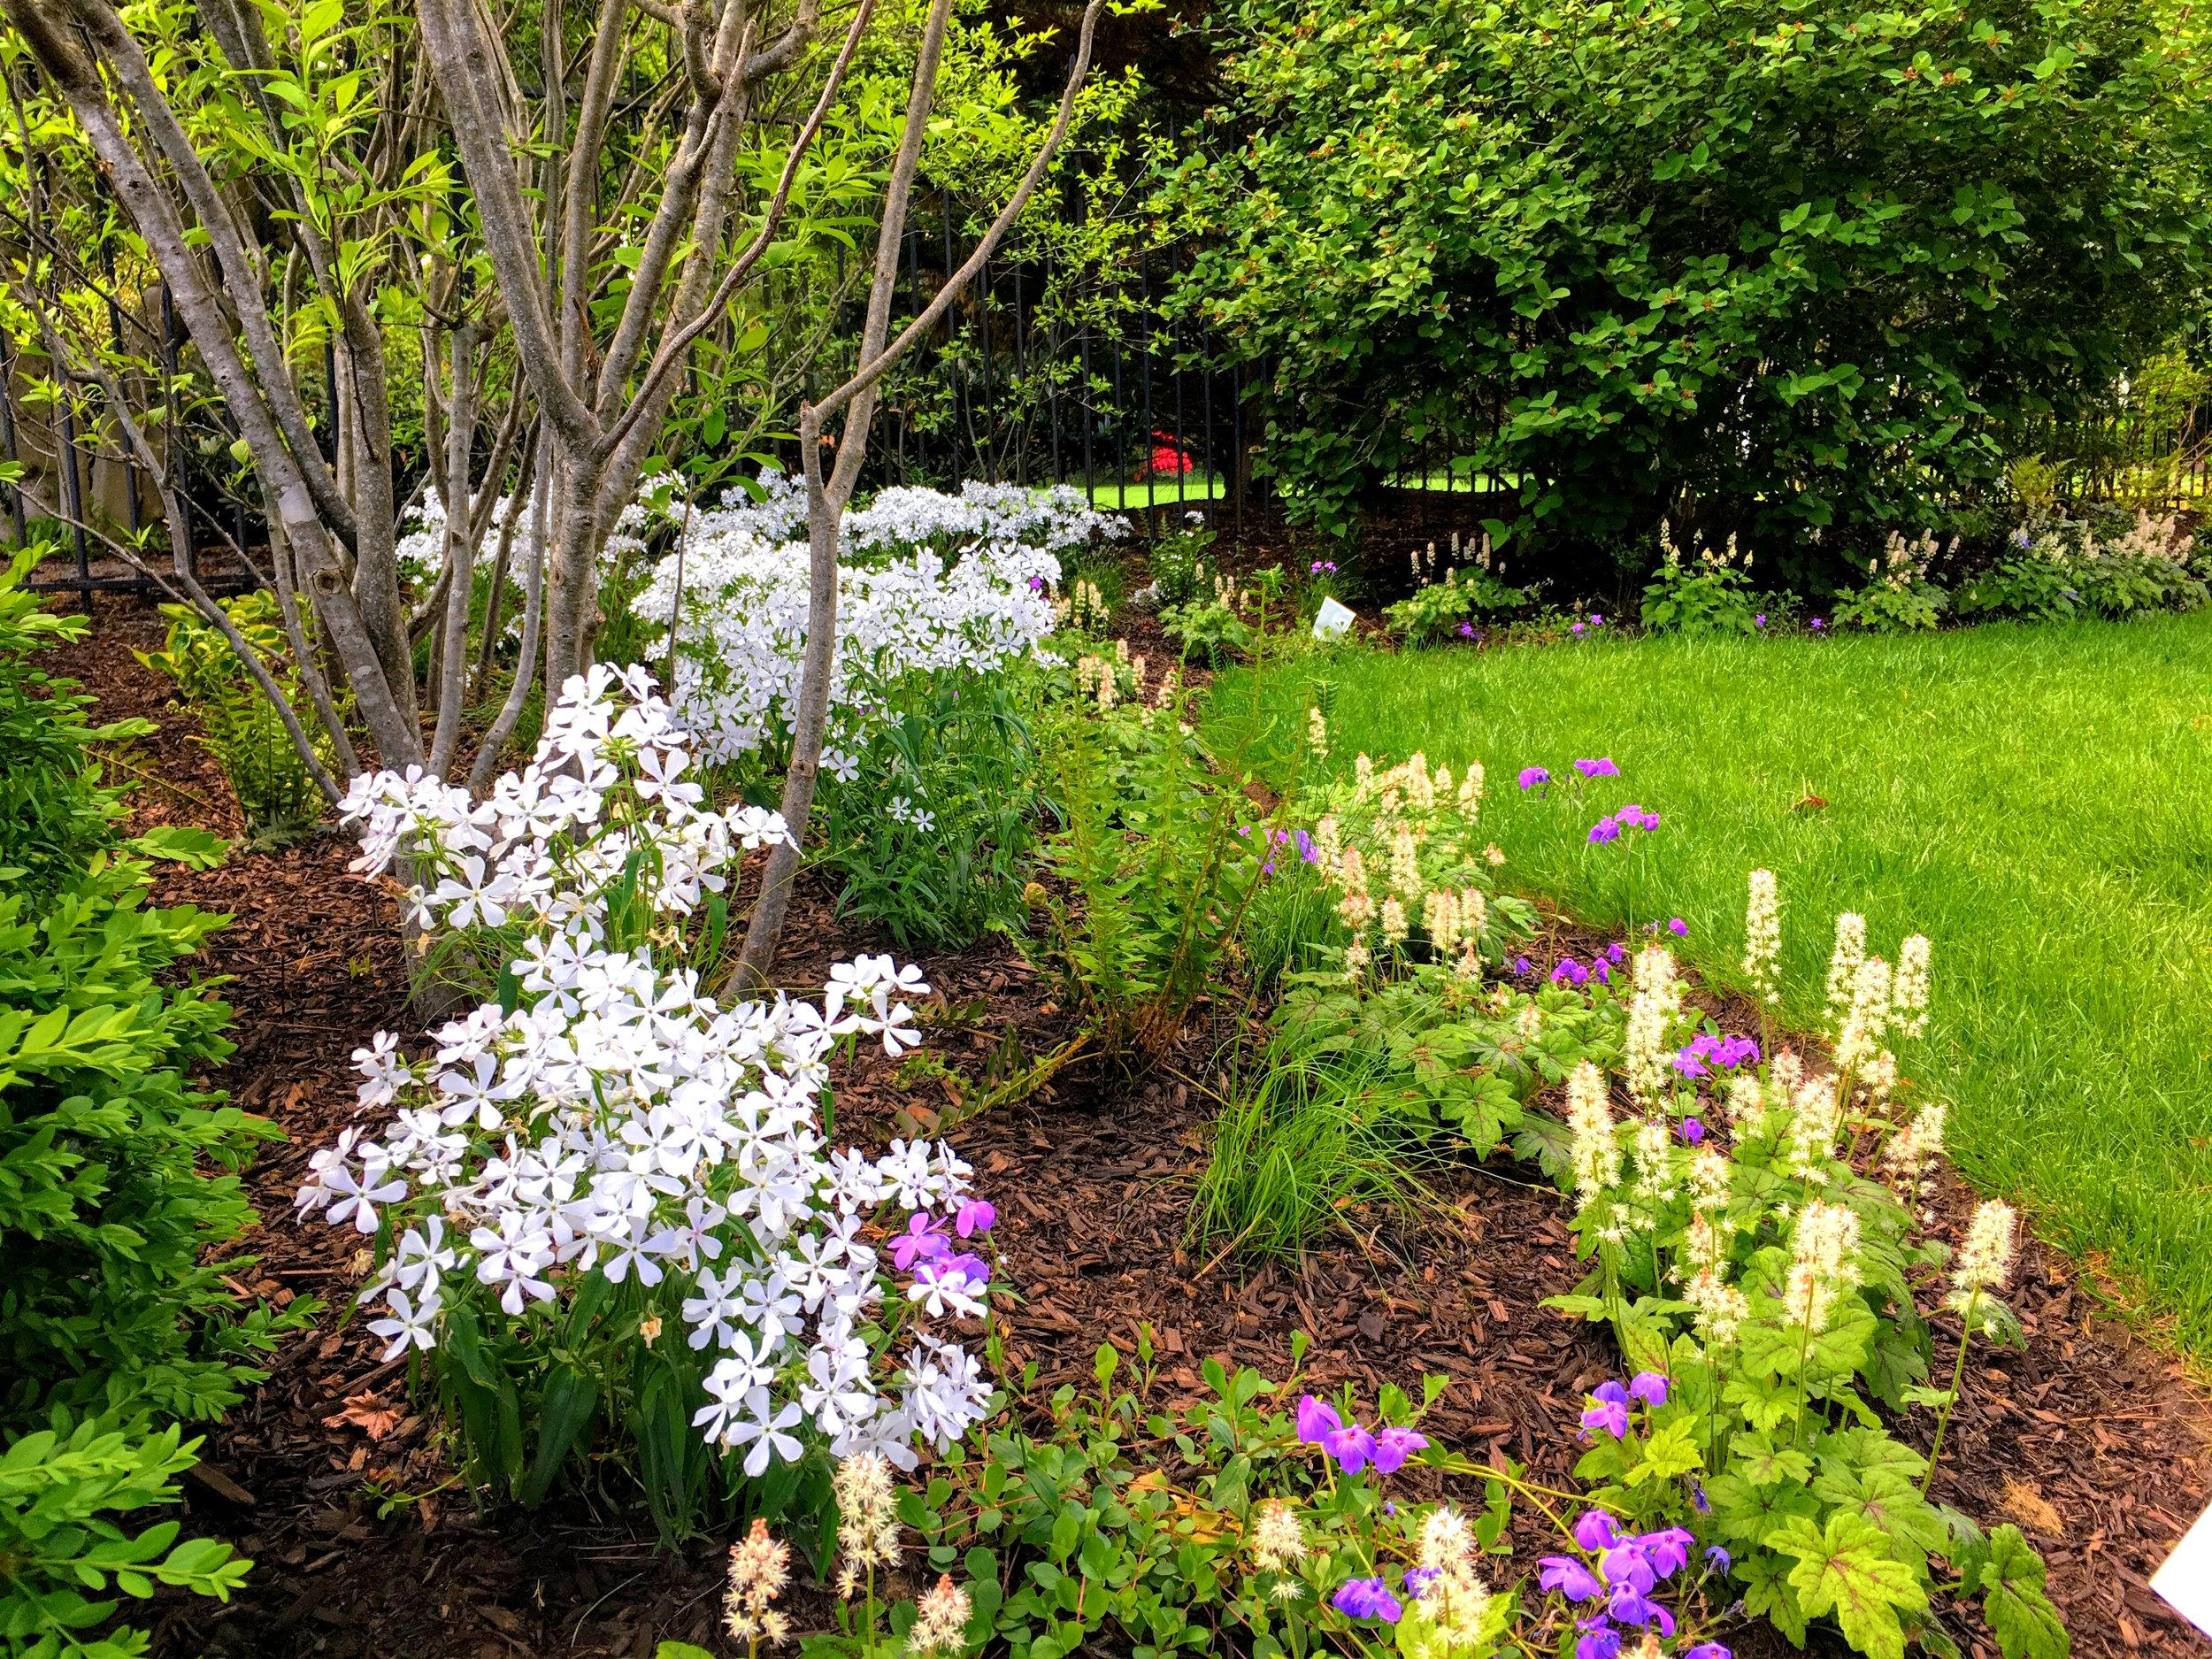 Spring Garden_phlox_foam flower_01_20190223.jpg